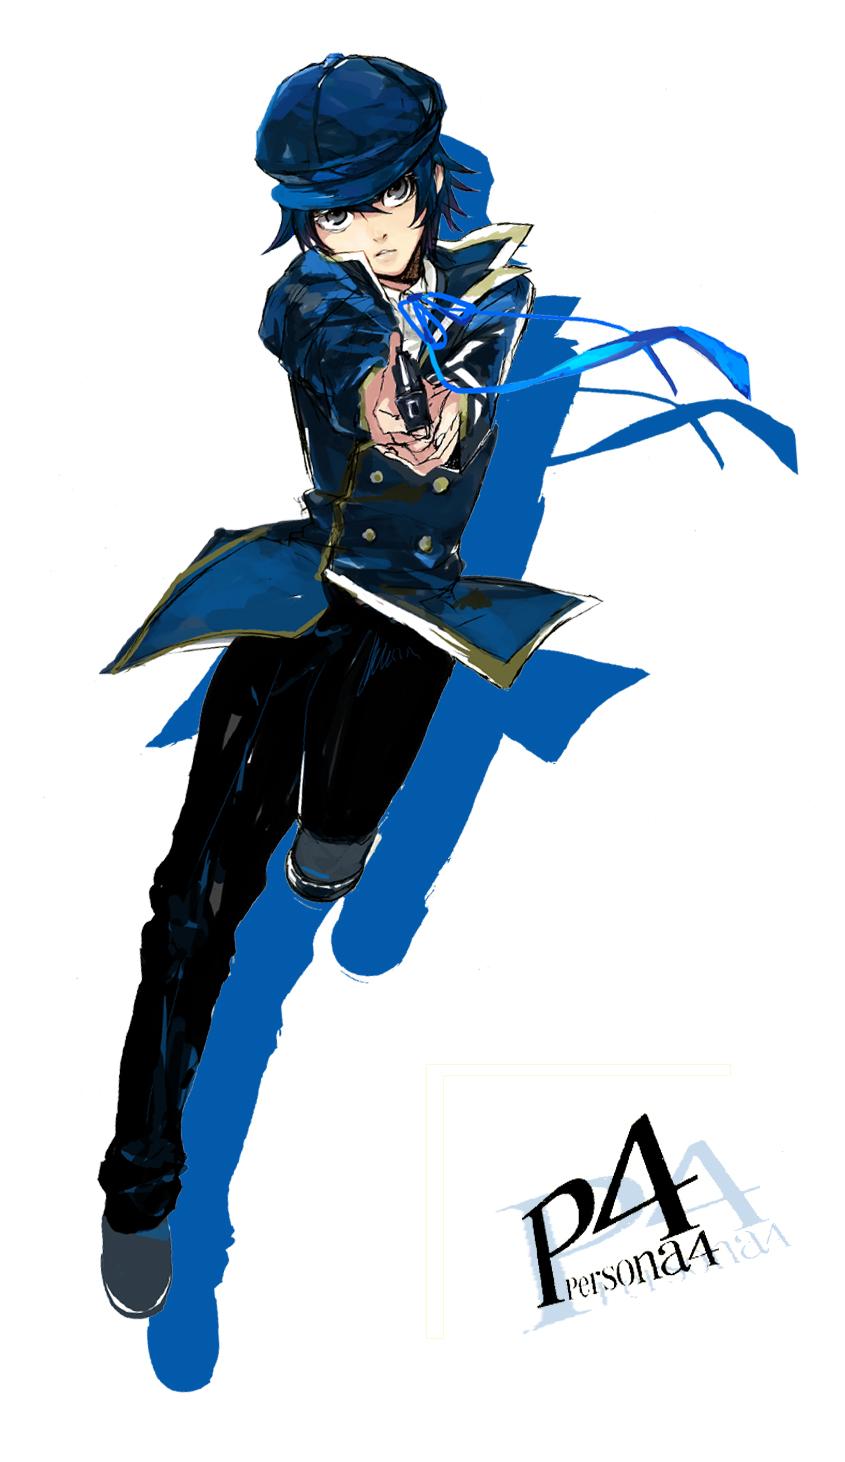 Persona 4 Anime Characters : Shirogane naoto shin megami tensei persona page